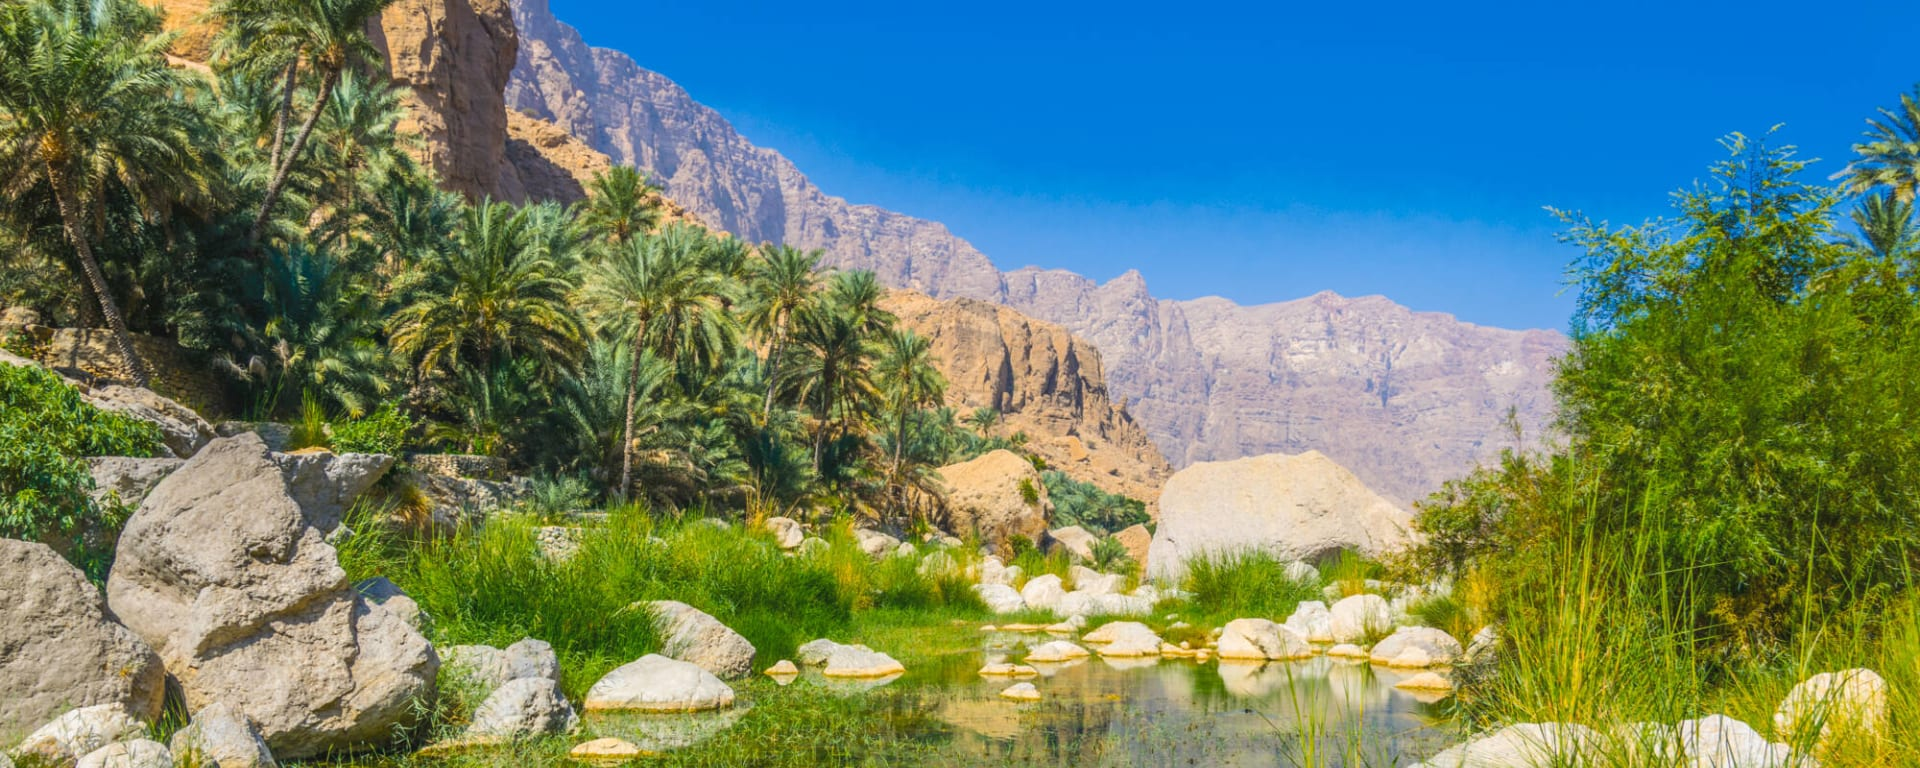 Natur & Kultur Oman ab Muscat: Oman Wadi Tiwi